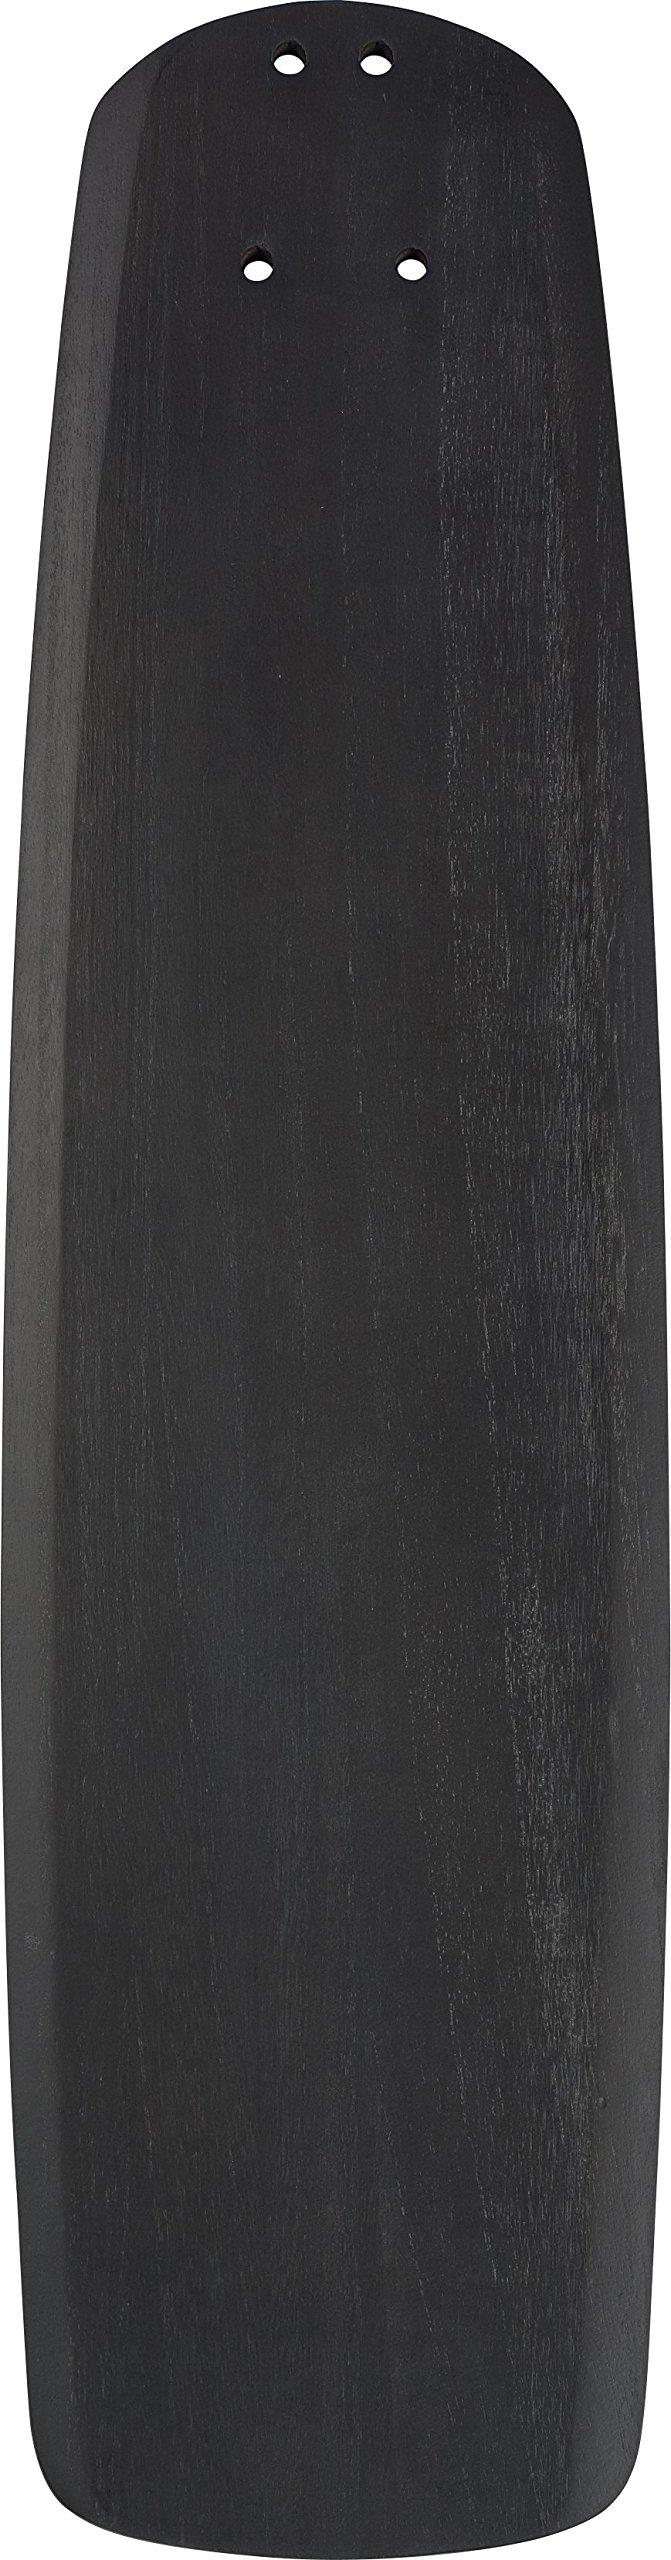 Emerson B78CR 25-inch Solid Wood Ceiling Fan Blades, 5-Piece Ceiling Fan Blade Set for Emerson Blade Select Series Ceiling Fans